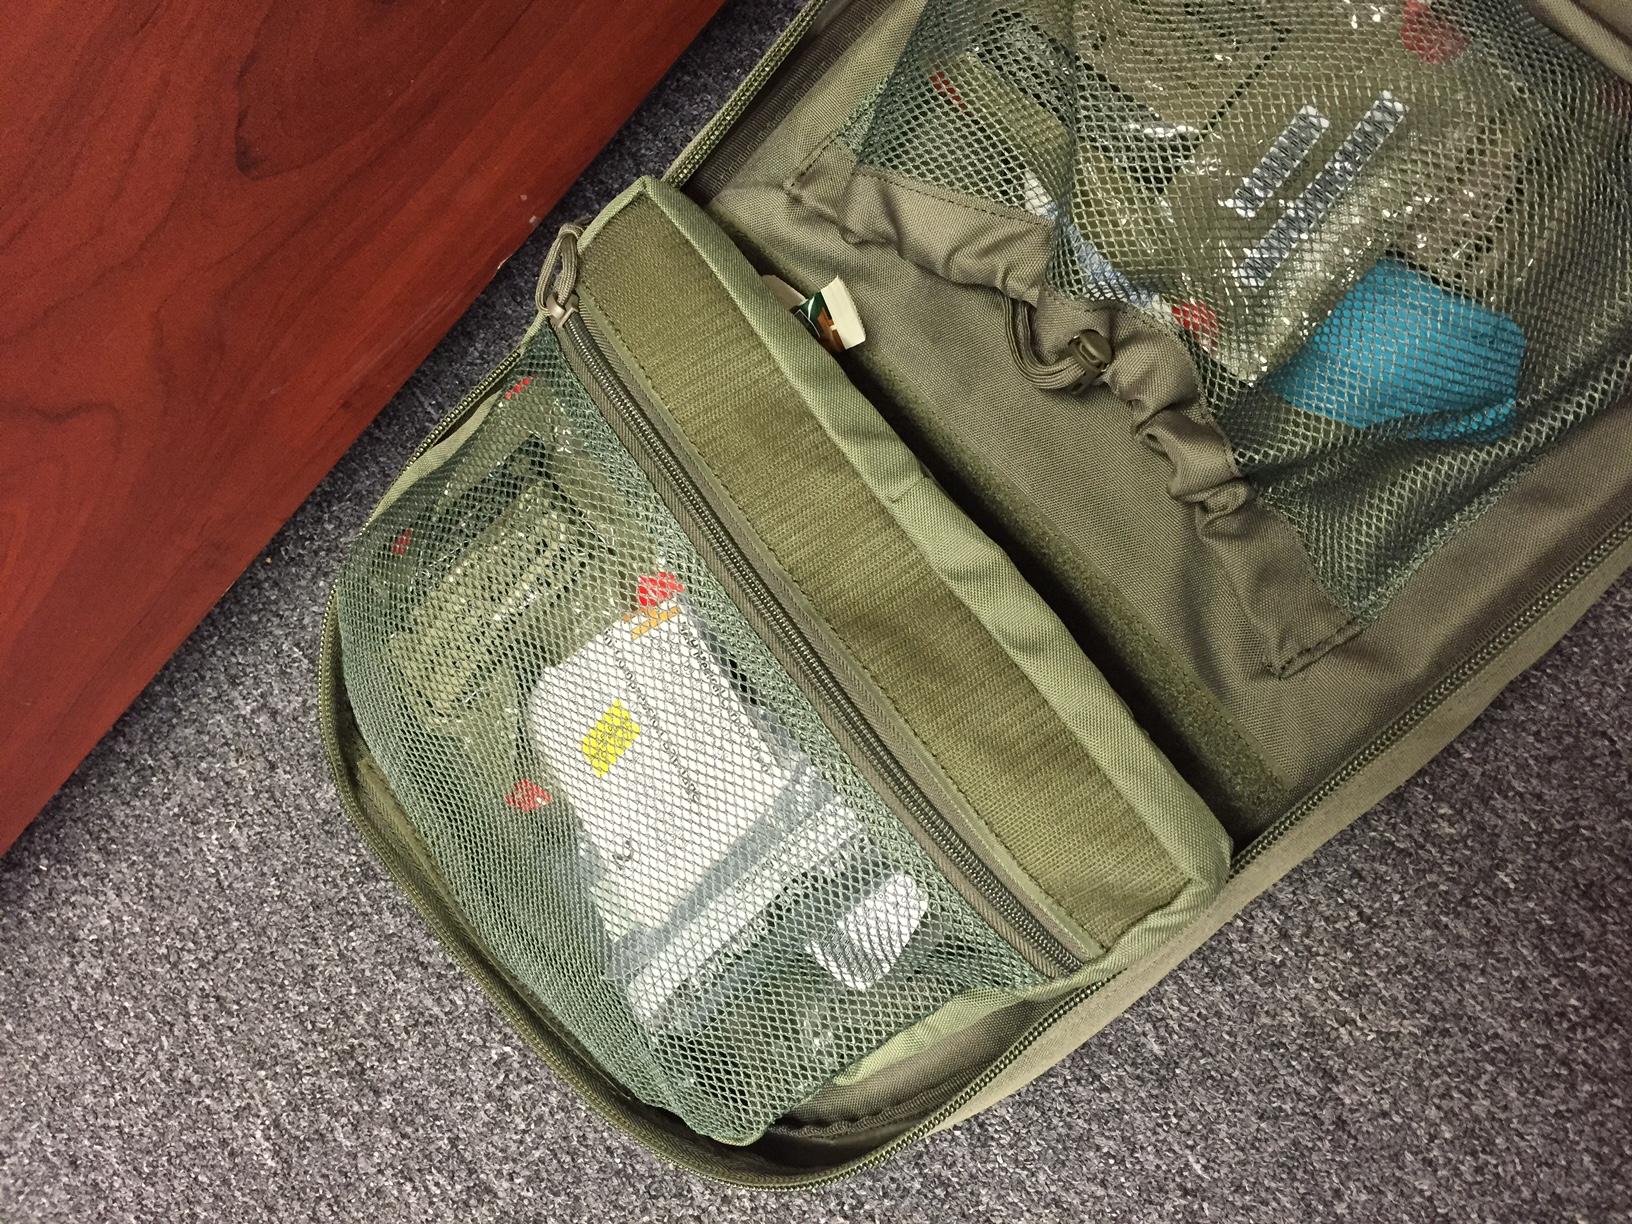 b4-sheriffs-bag-1.jpeg